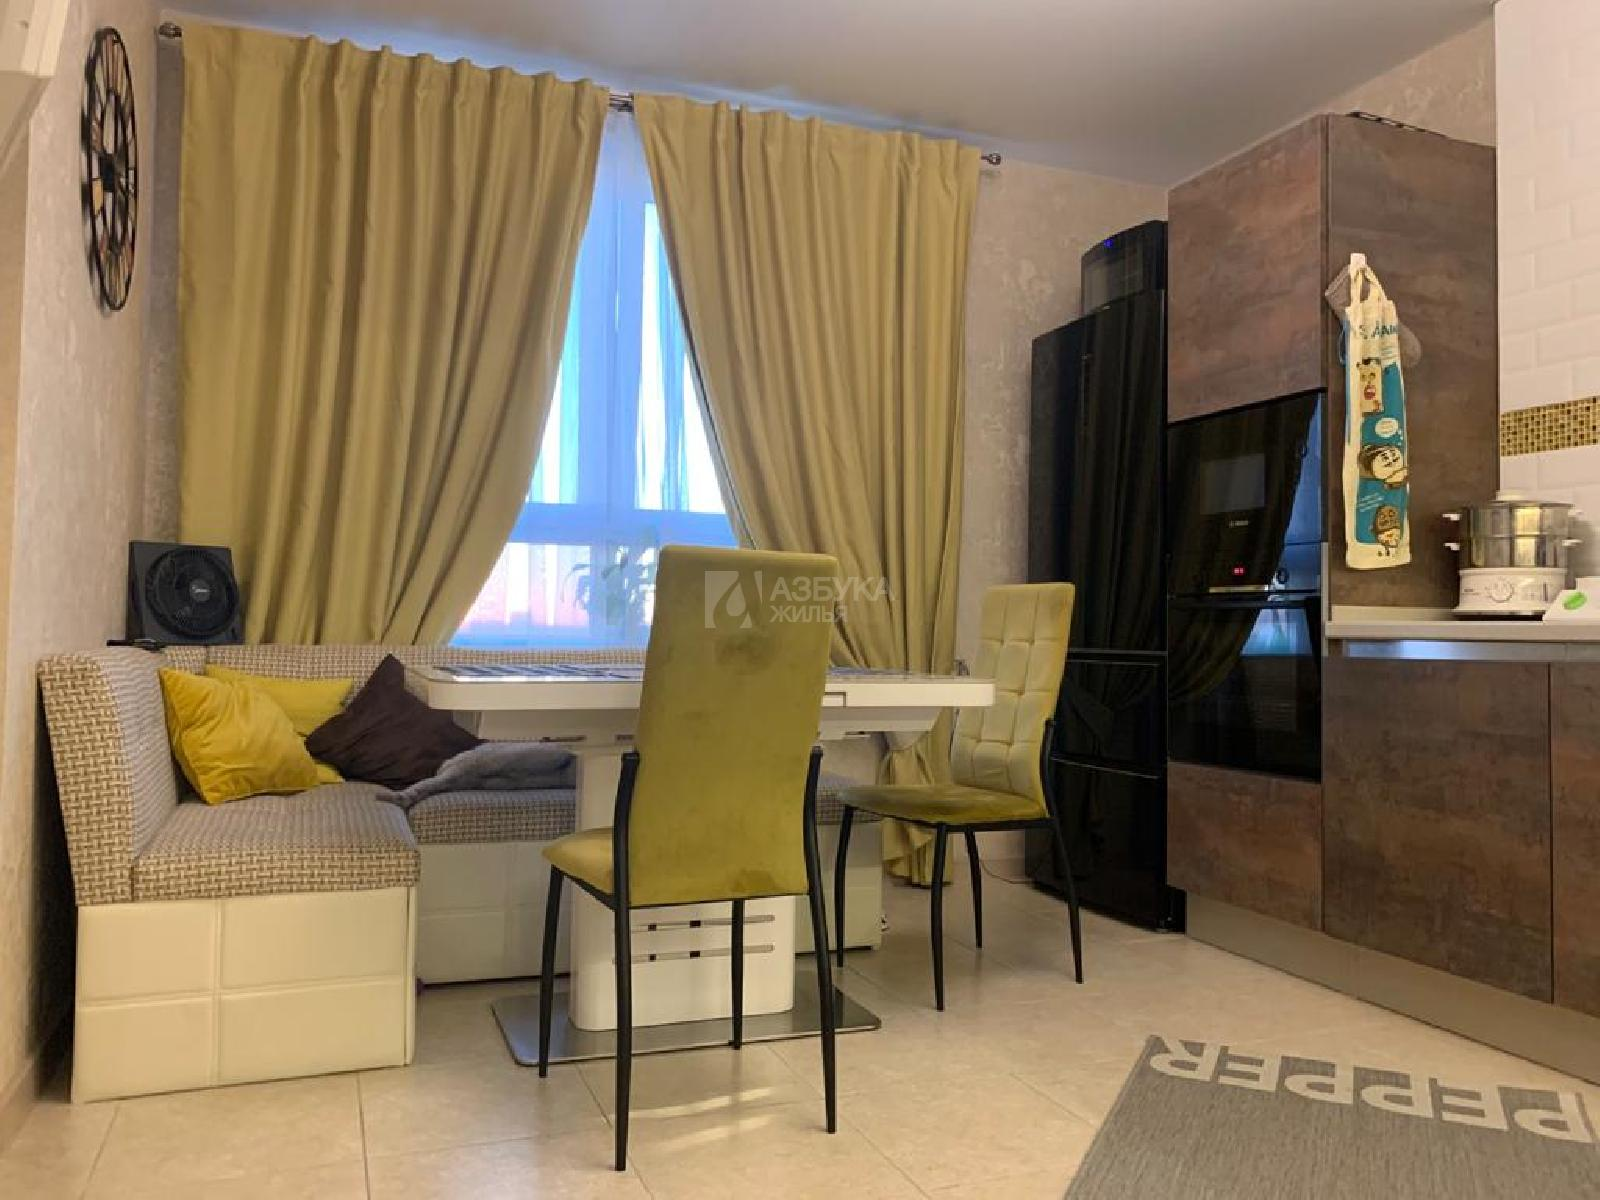 Фото №8 - 3-комнатная квартира, Москва, Поляны улица 5, метро Улица Скобелевская